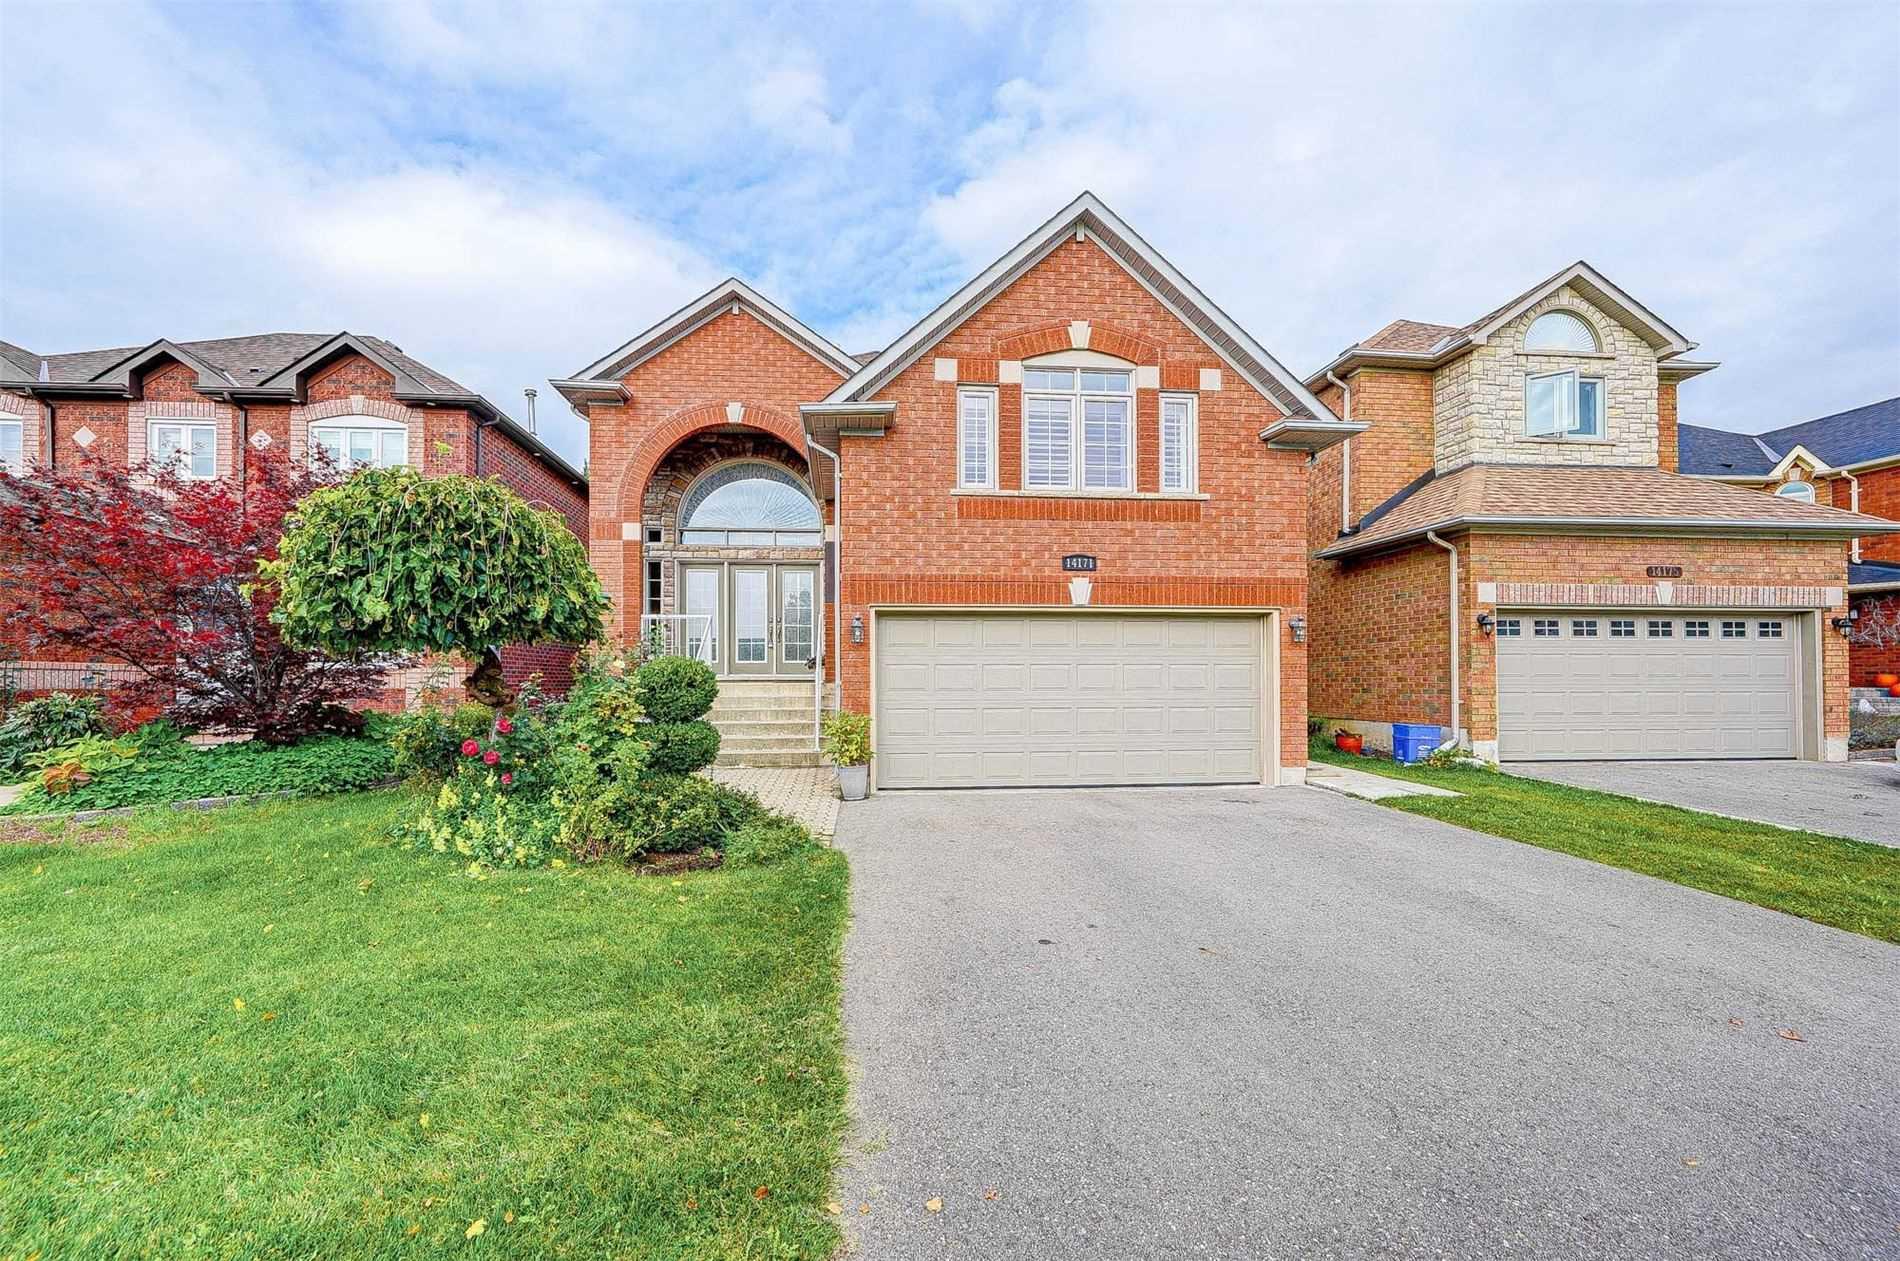 Detached house For Sale In Halton Hills - 14171 Argyll Rd, Halton Hills, Ontario, Canada L7G 5T9 , 3 Bedrooms Bedrooms, ,4 BathroomsBathrooms,Detached,For Sale,Argyll